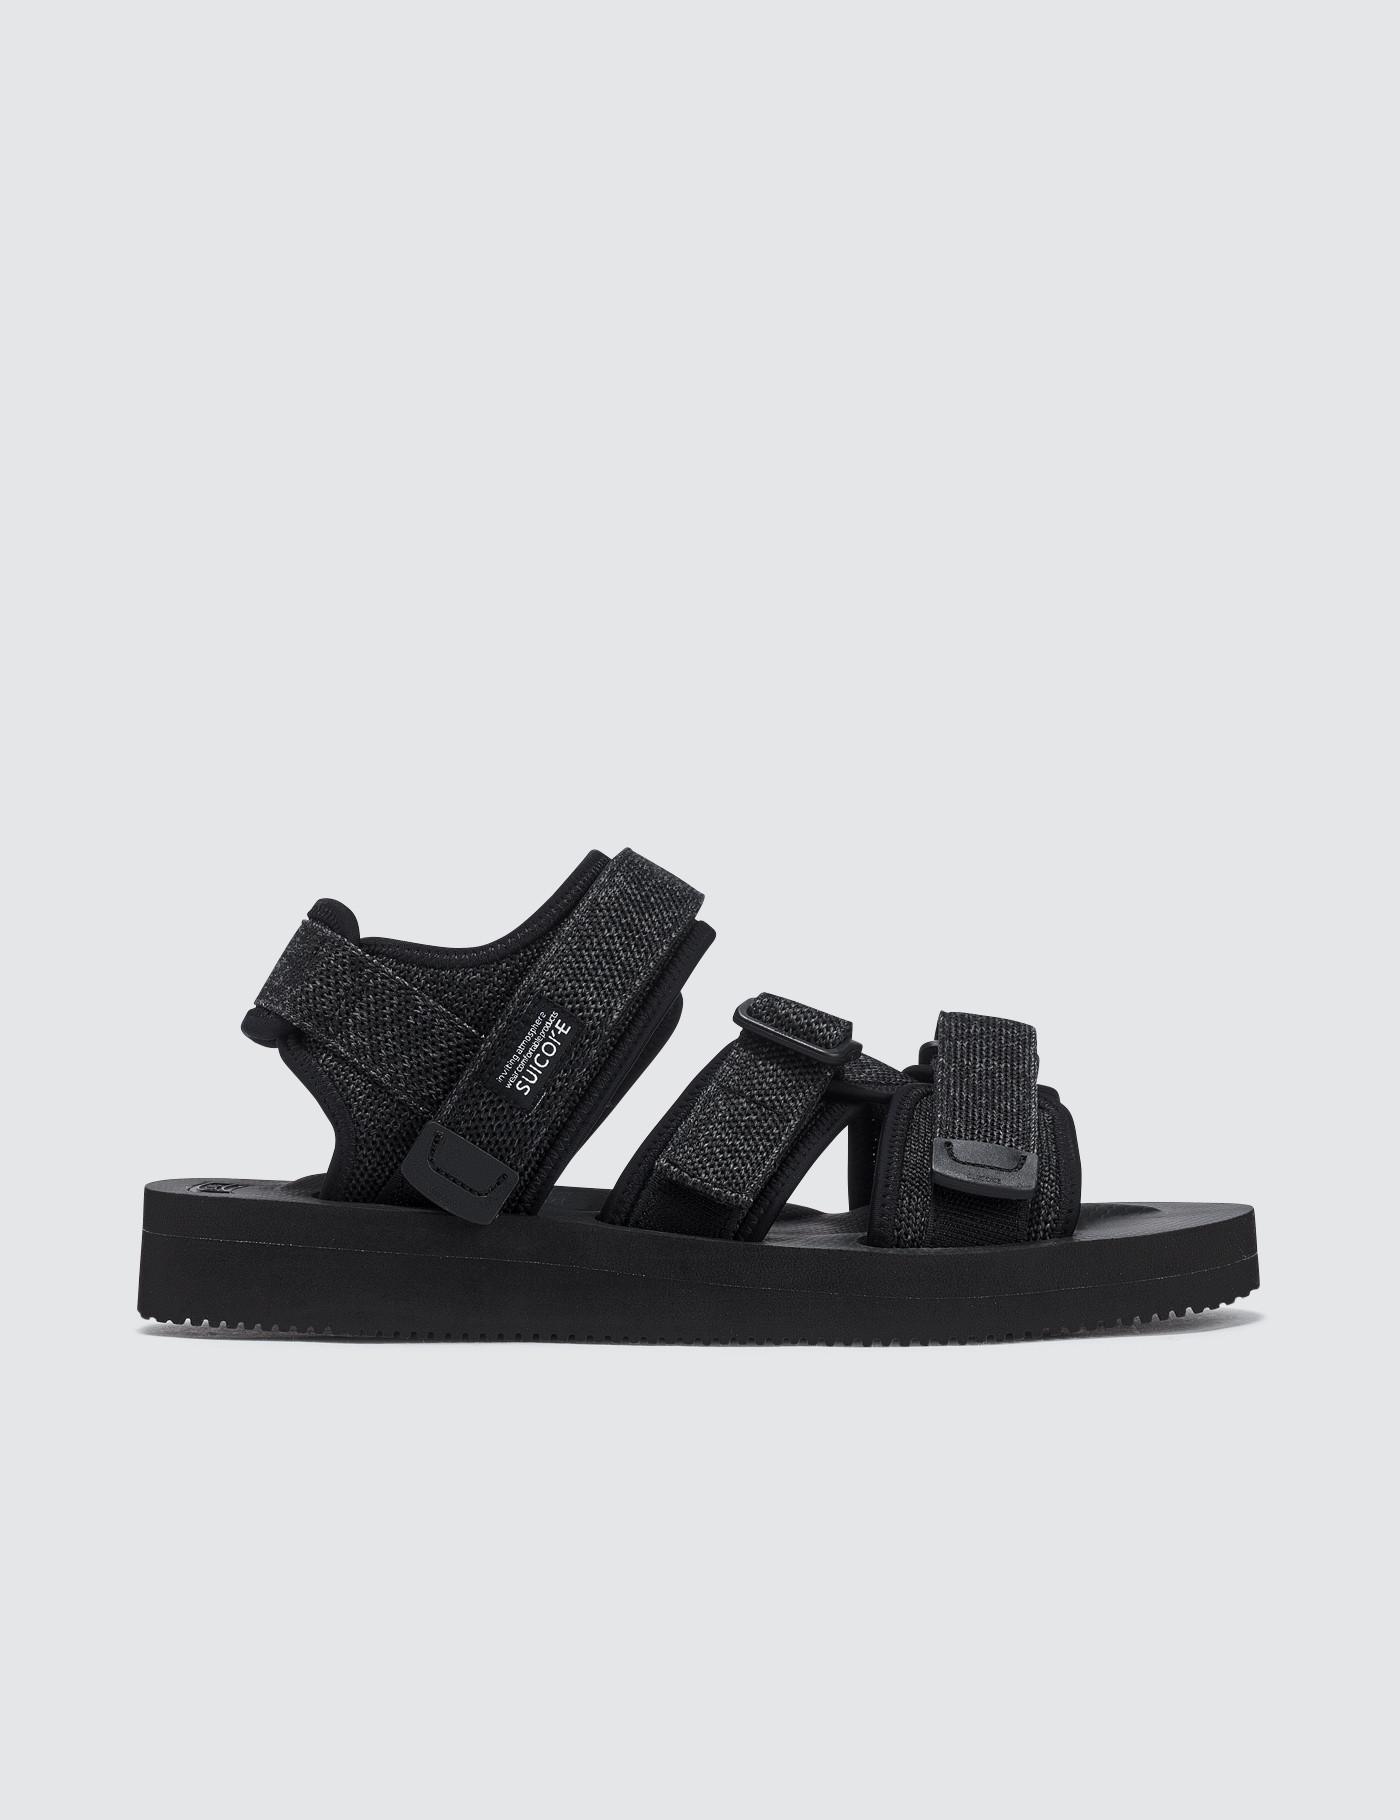 b971fda93ed2 Suicoke Kisee-vkn Sandals in Black for Men - Lyst